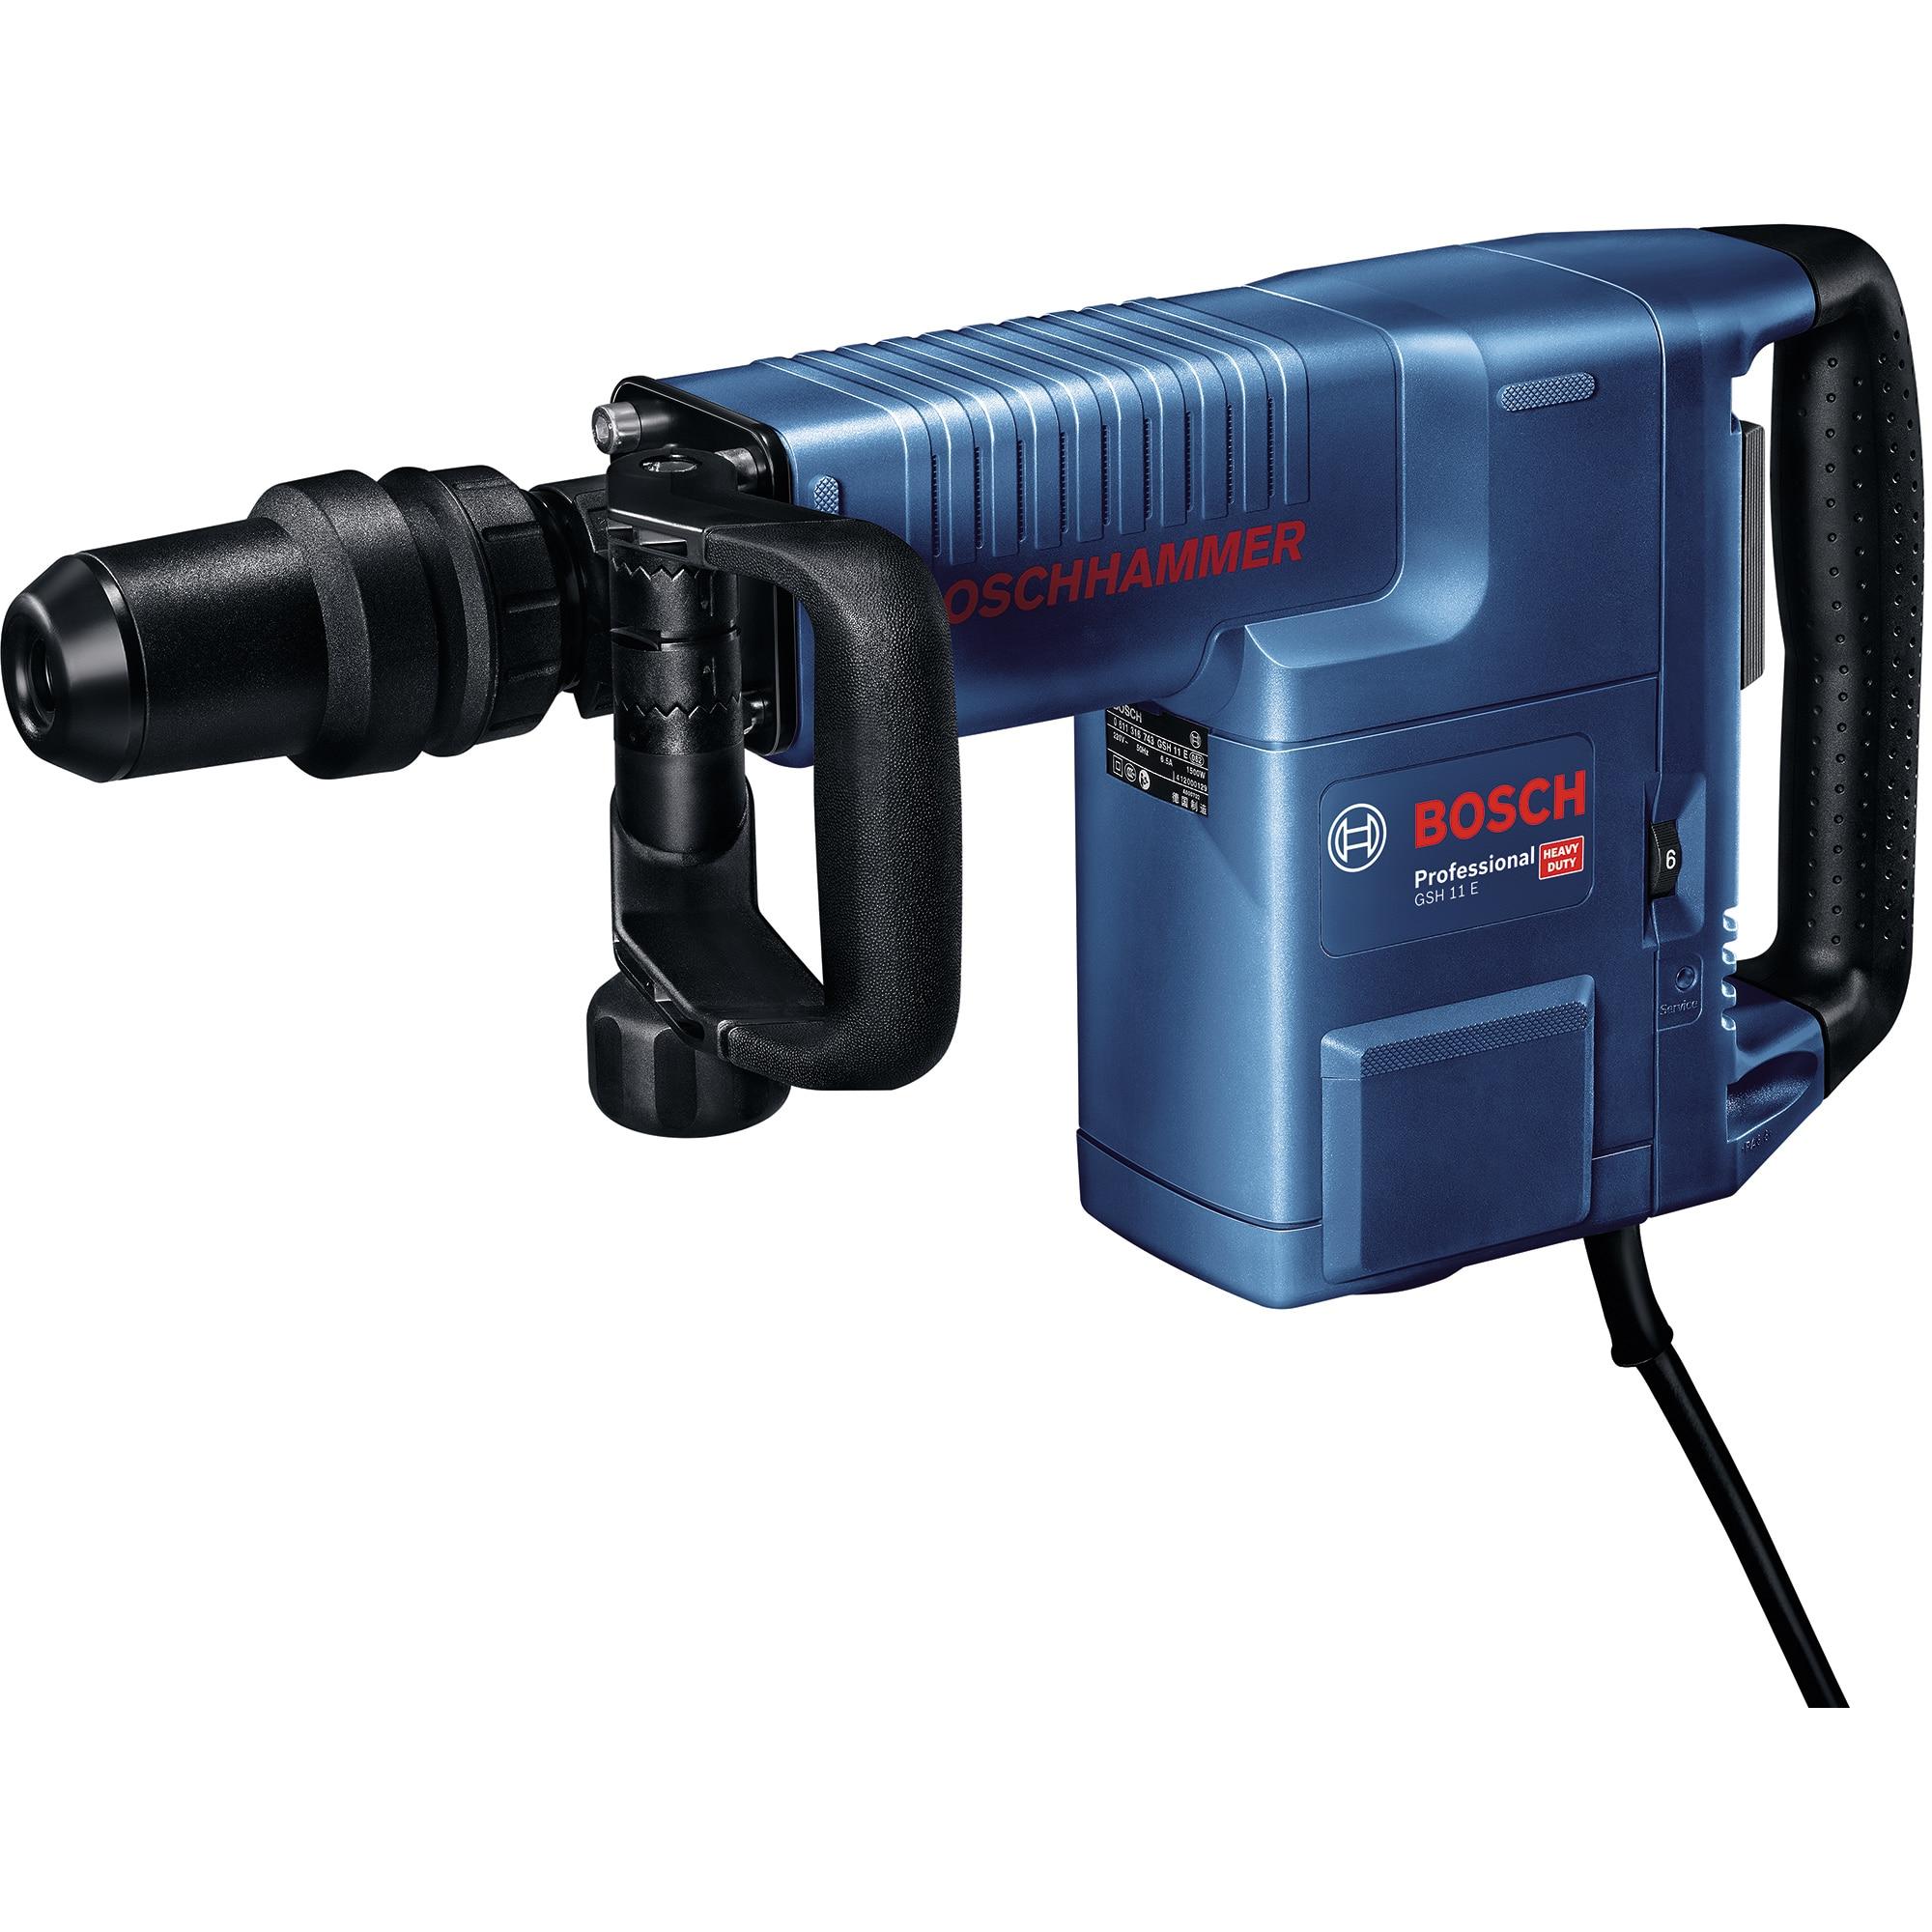 Fotografie Ciocan demolator Bosch Professional SDS Max GSH 11 E, 1500 W, 16.8 J, 1890 PPM + maner suplimentar + valiza profesionala + 1 dalta + tub de vaselina + laveta